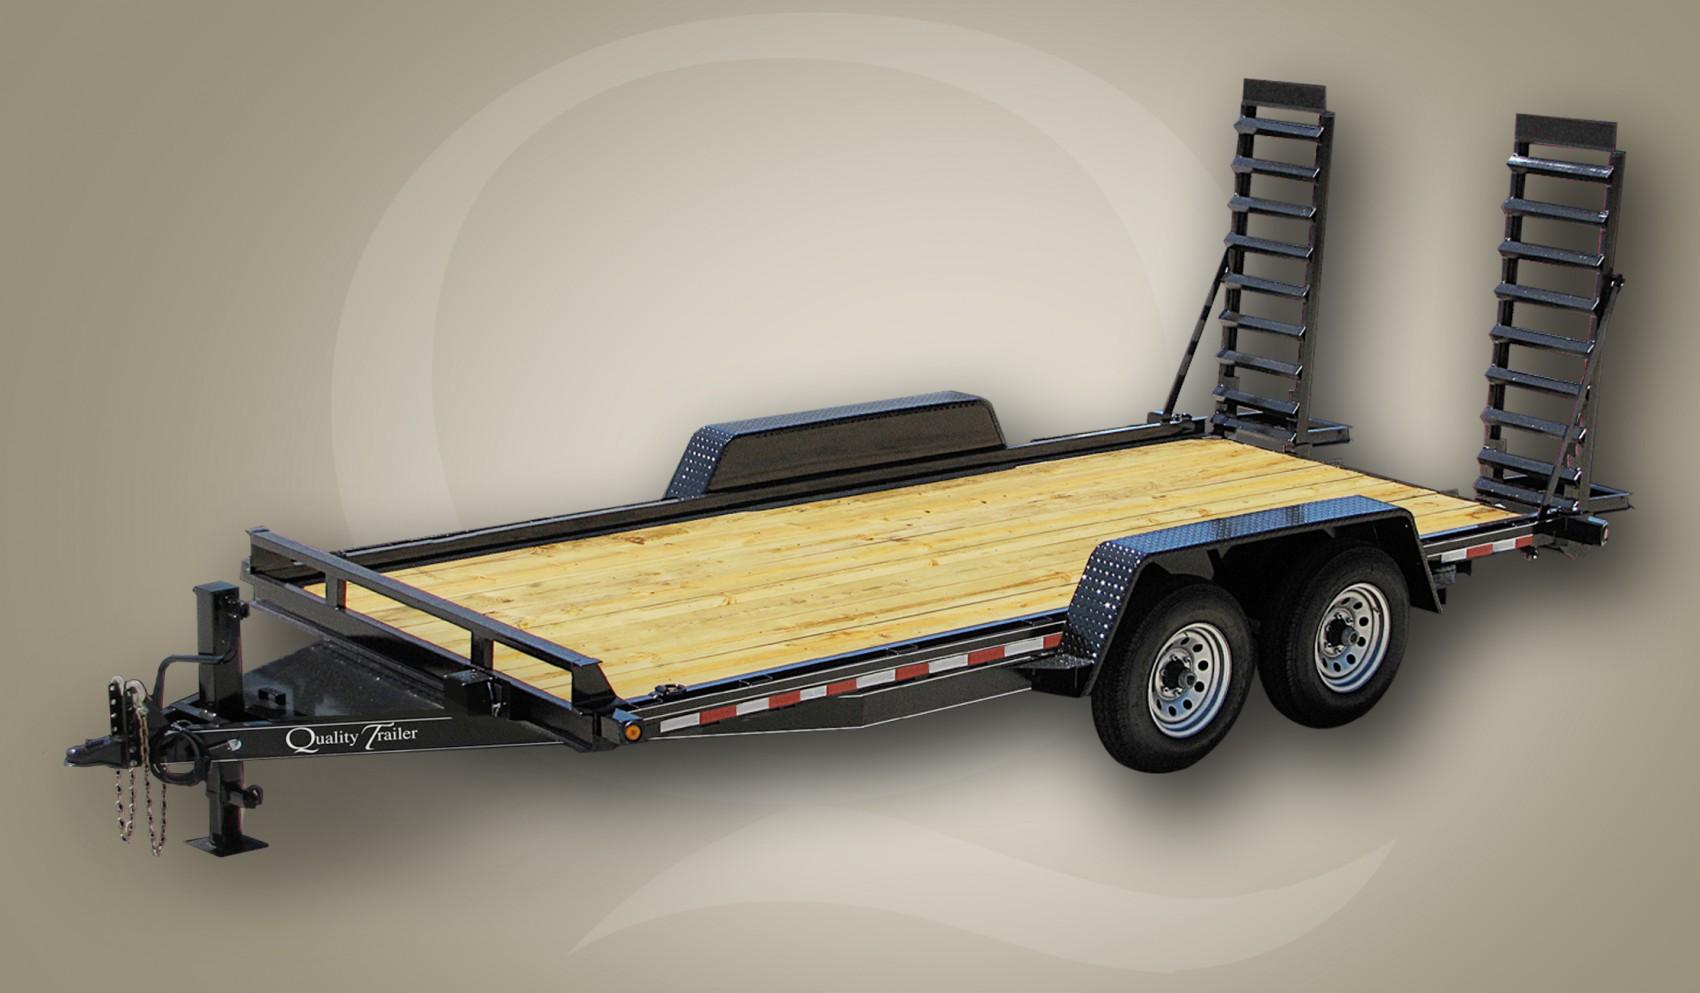 Bobcat Trailer Fenders : Skid steer professional grade gvw quality trailers